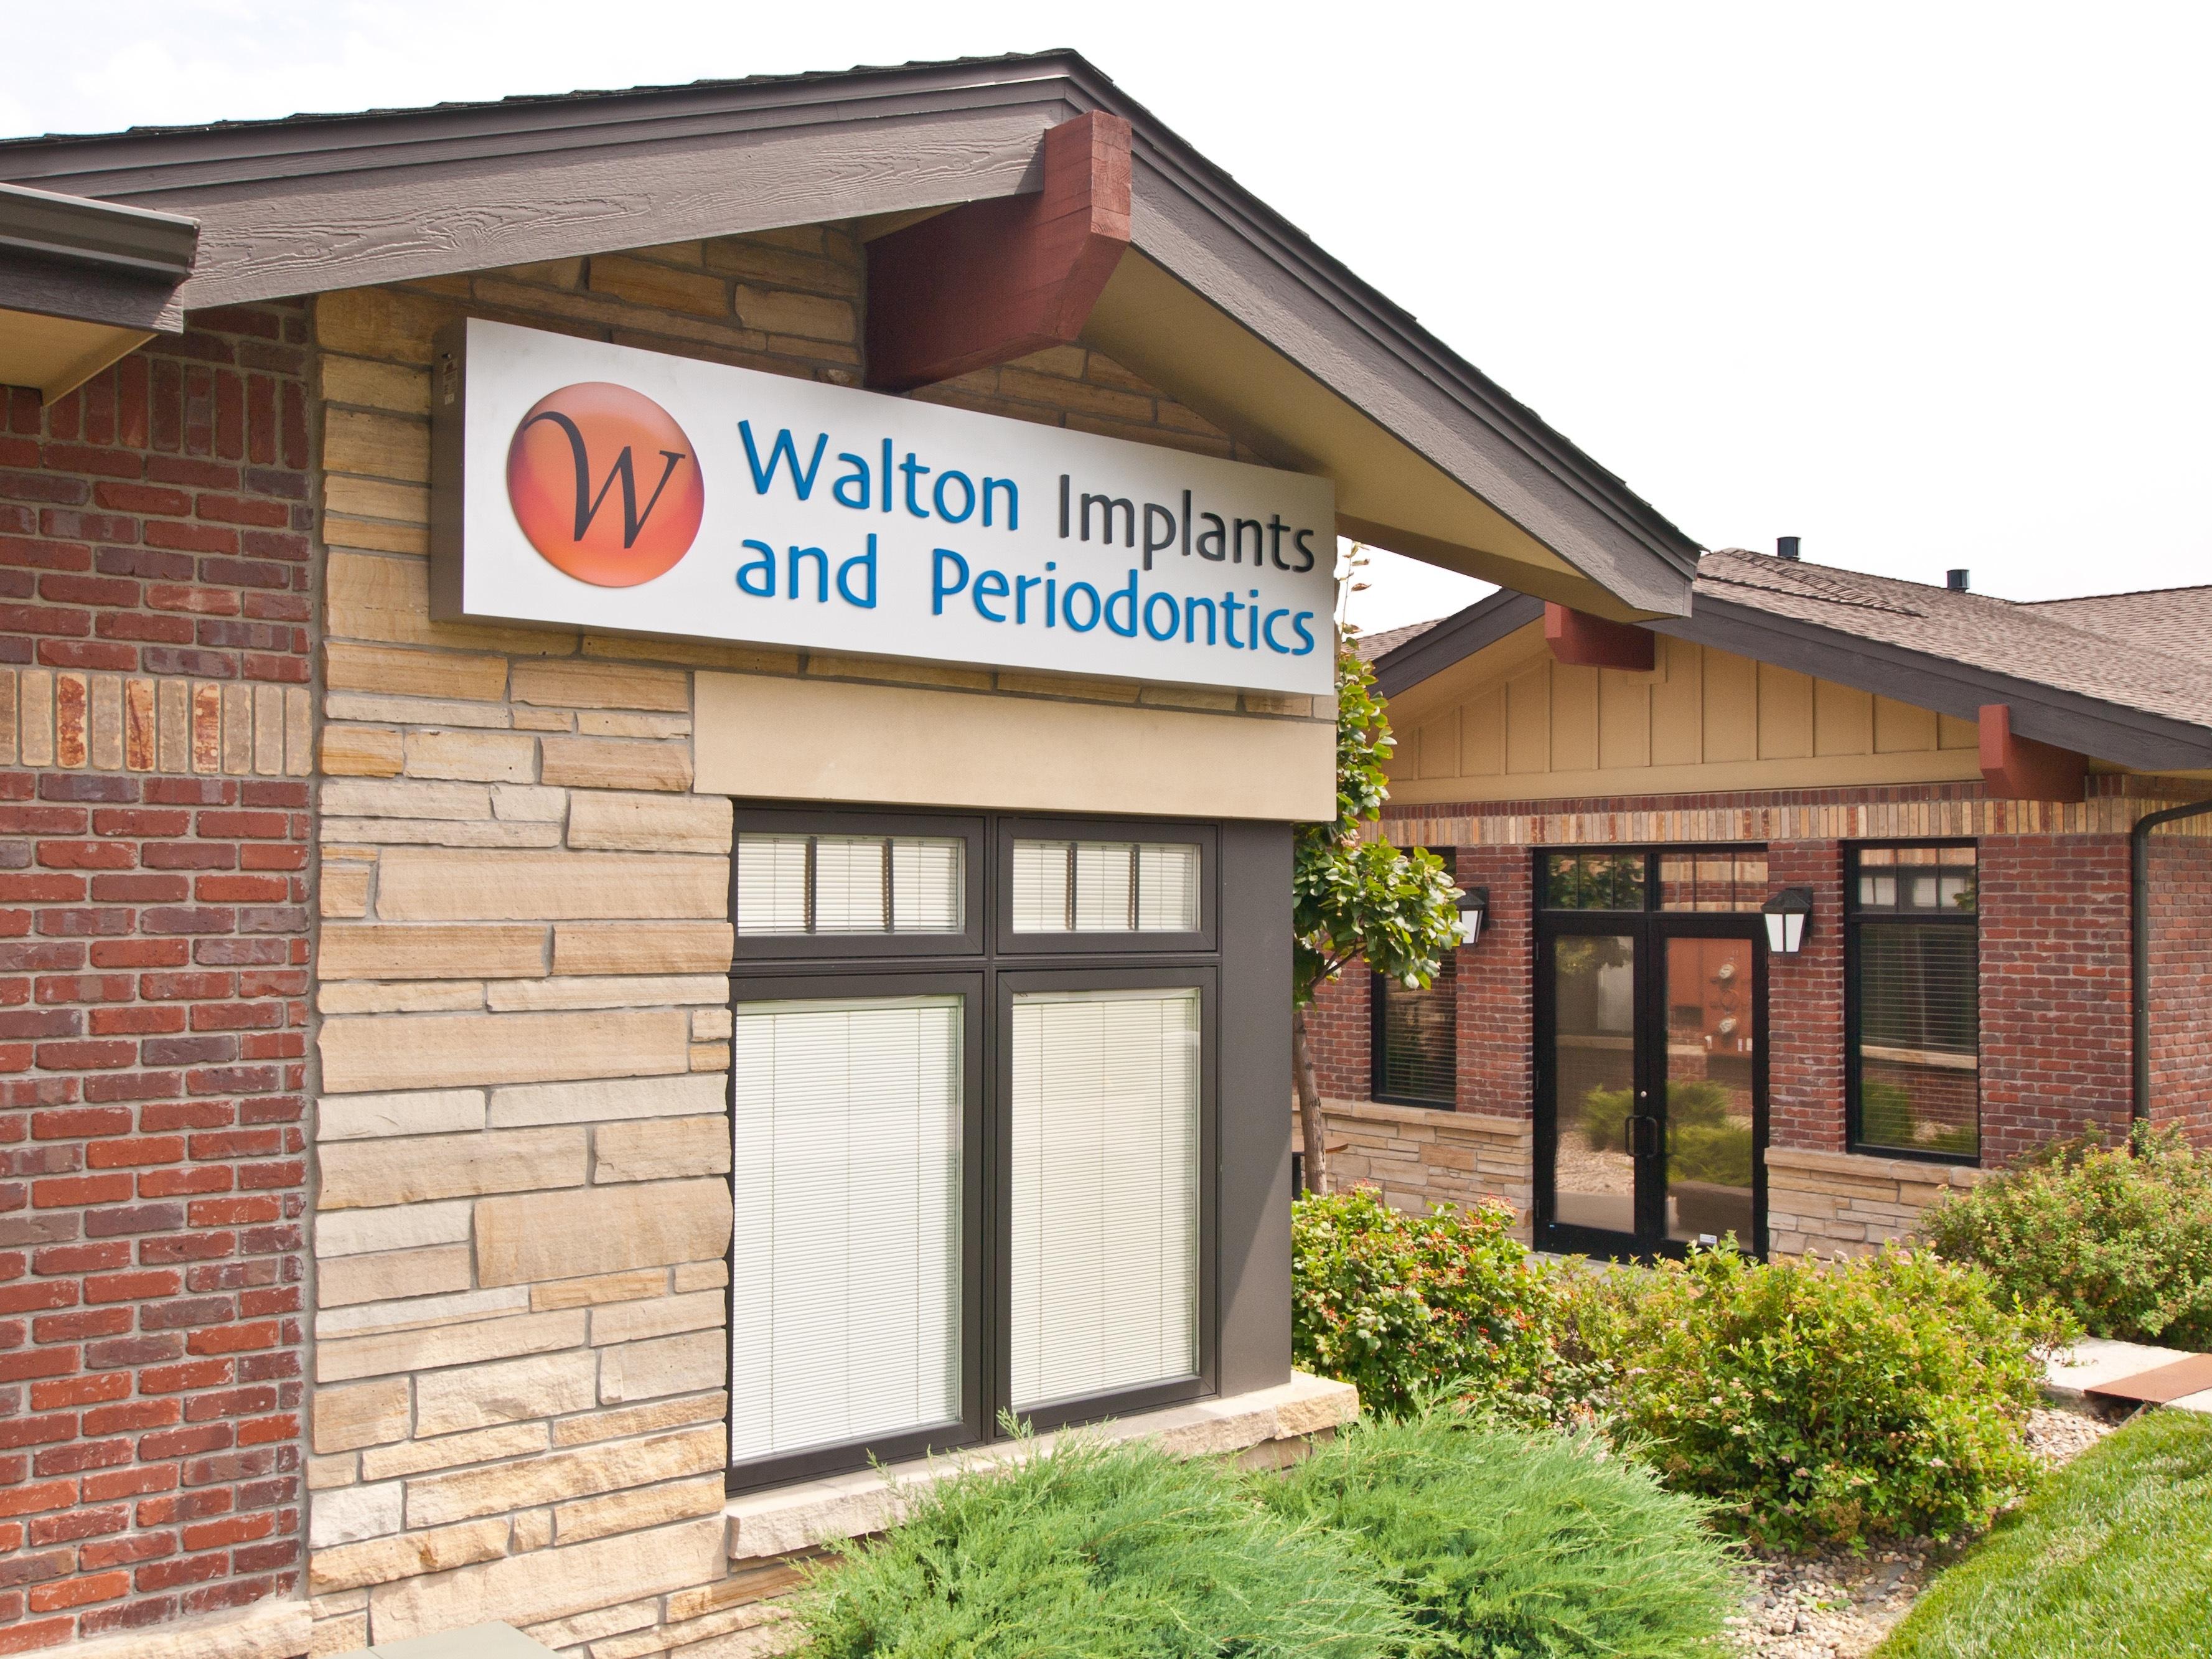 Walton Implants and Periodontics image 11